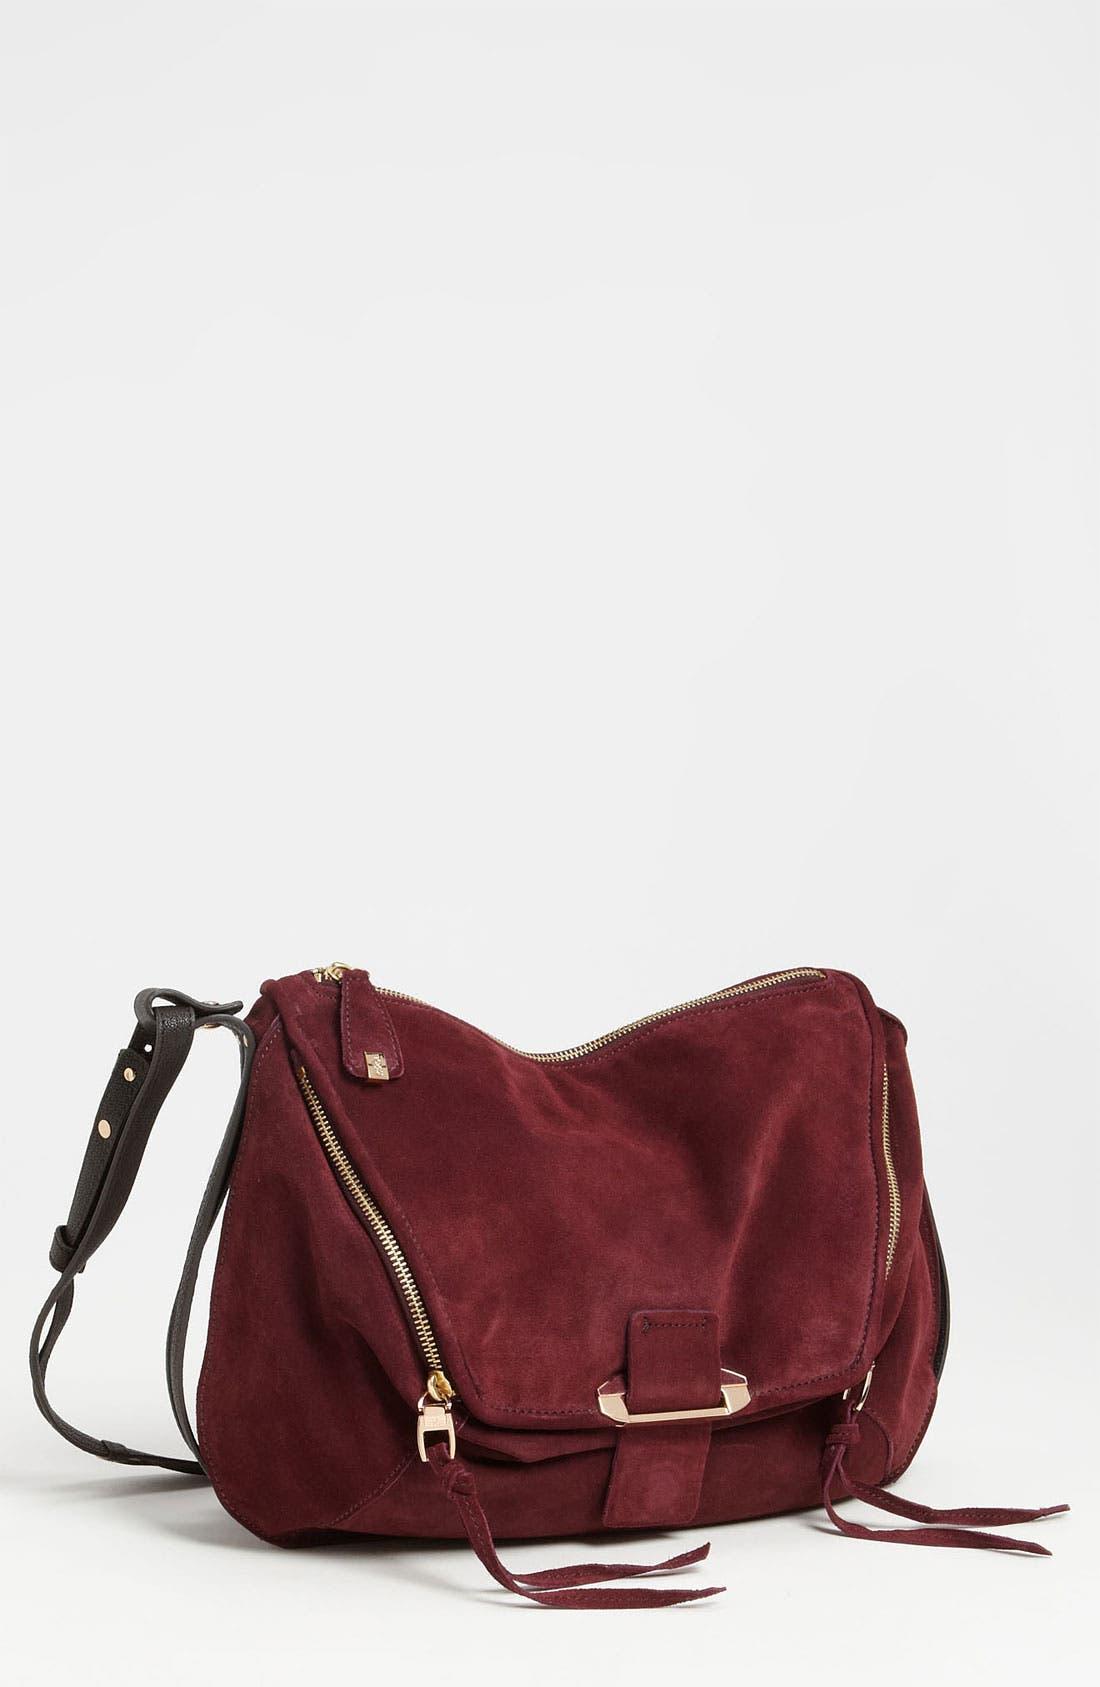 Main Image - Kooba 'Leroy' Crossbody Bag